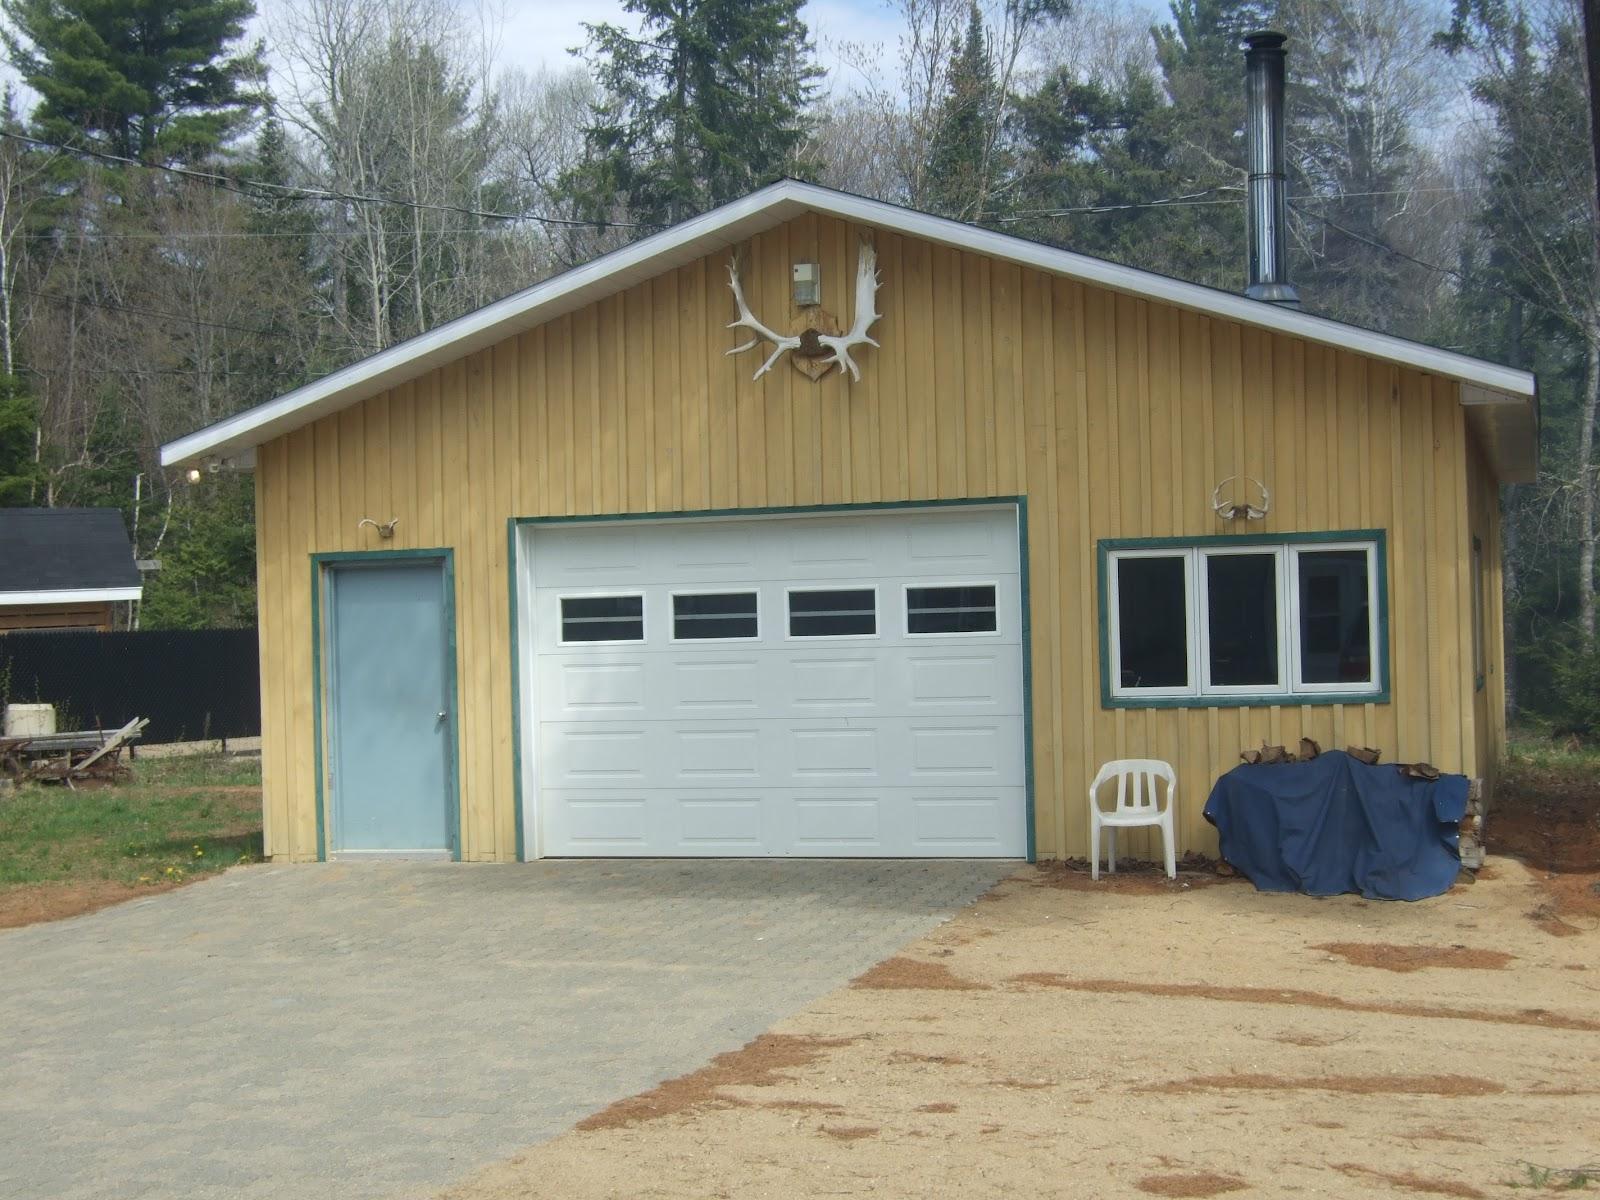 Chez brijit et lany garage cabanon et remise bois for Cabanon bois